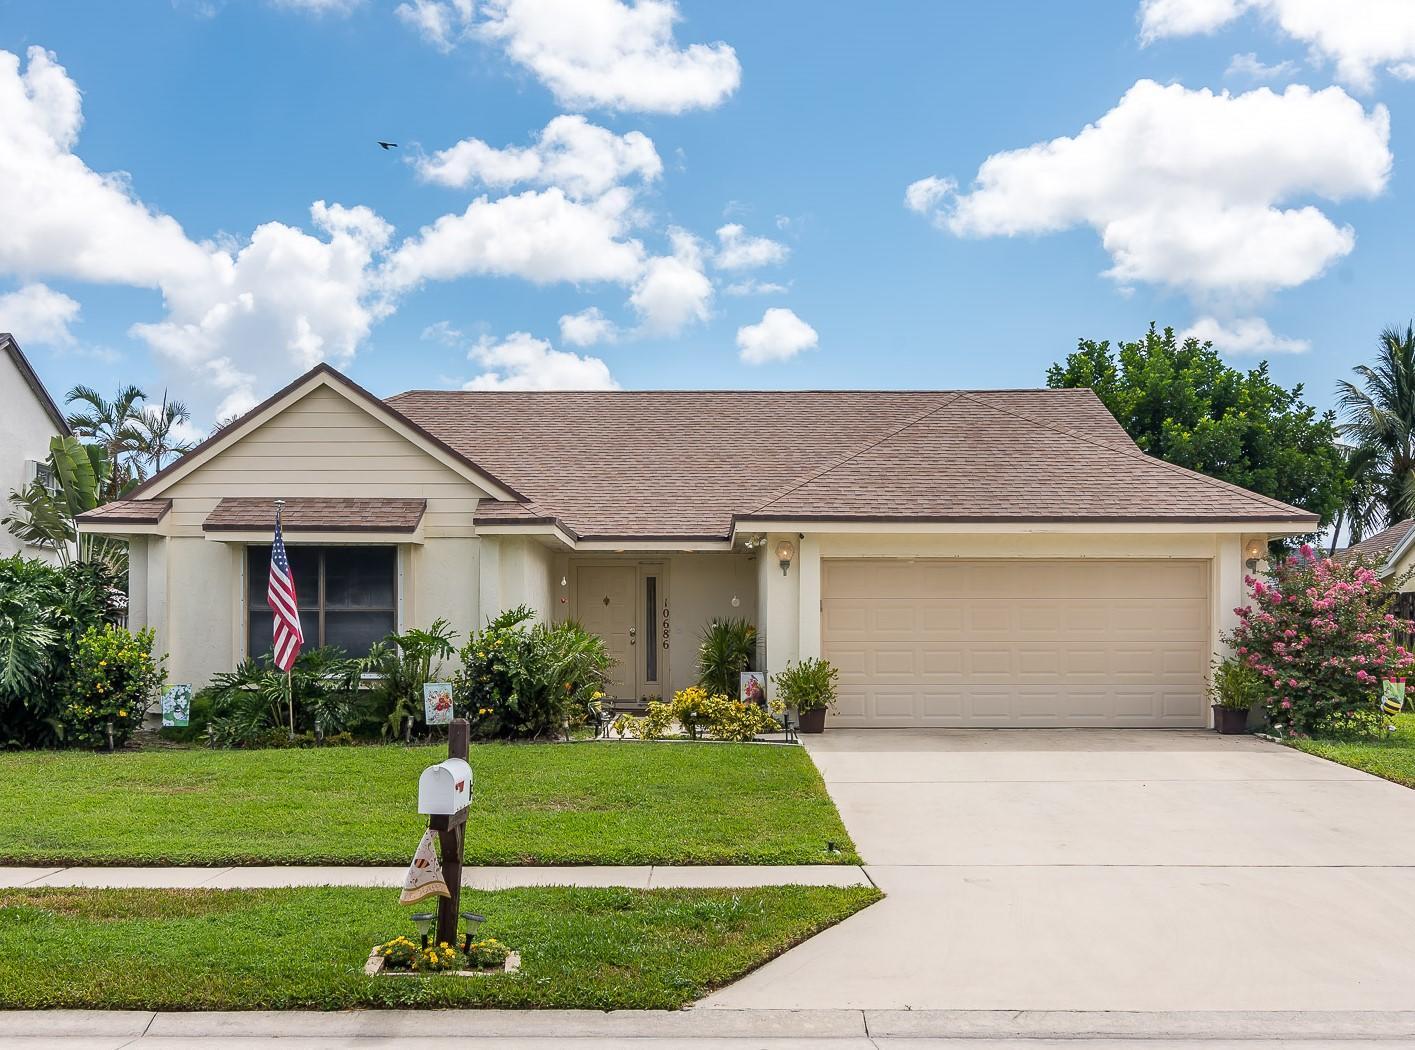 10686 Mandya Court, Boynton Beach, Florida 33437, 3 Bedrooms Bedrooms, ,2 BathroomsBathrooms,A,Single family,Mandya,RX-10456679